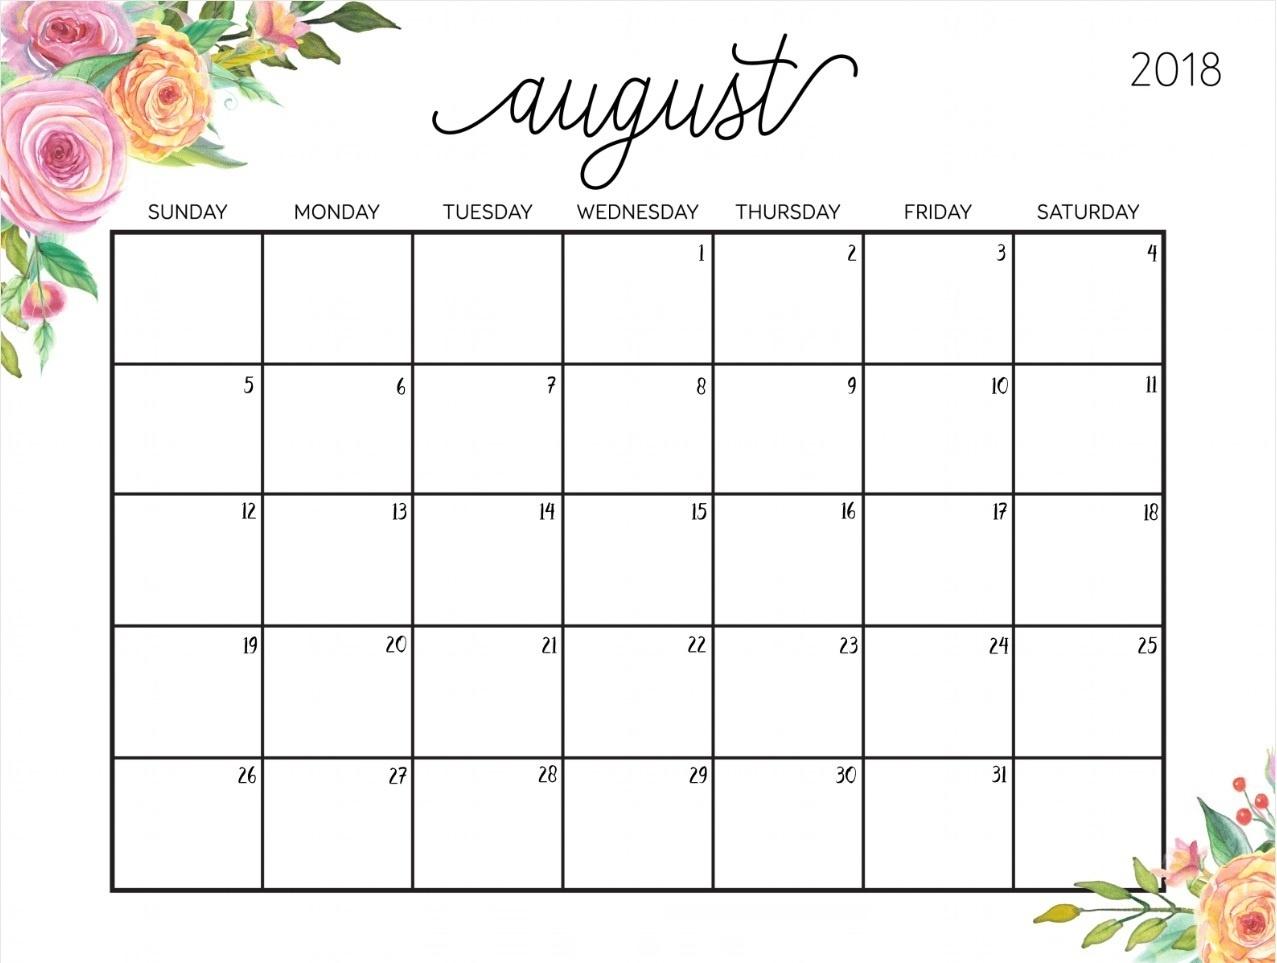 Printable Calendar For August 2018 - Free Printable Calendar, Blank - Free Printable Clipart For August